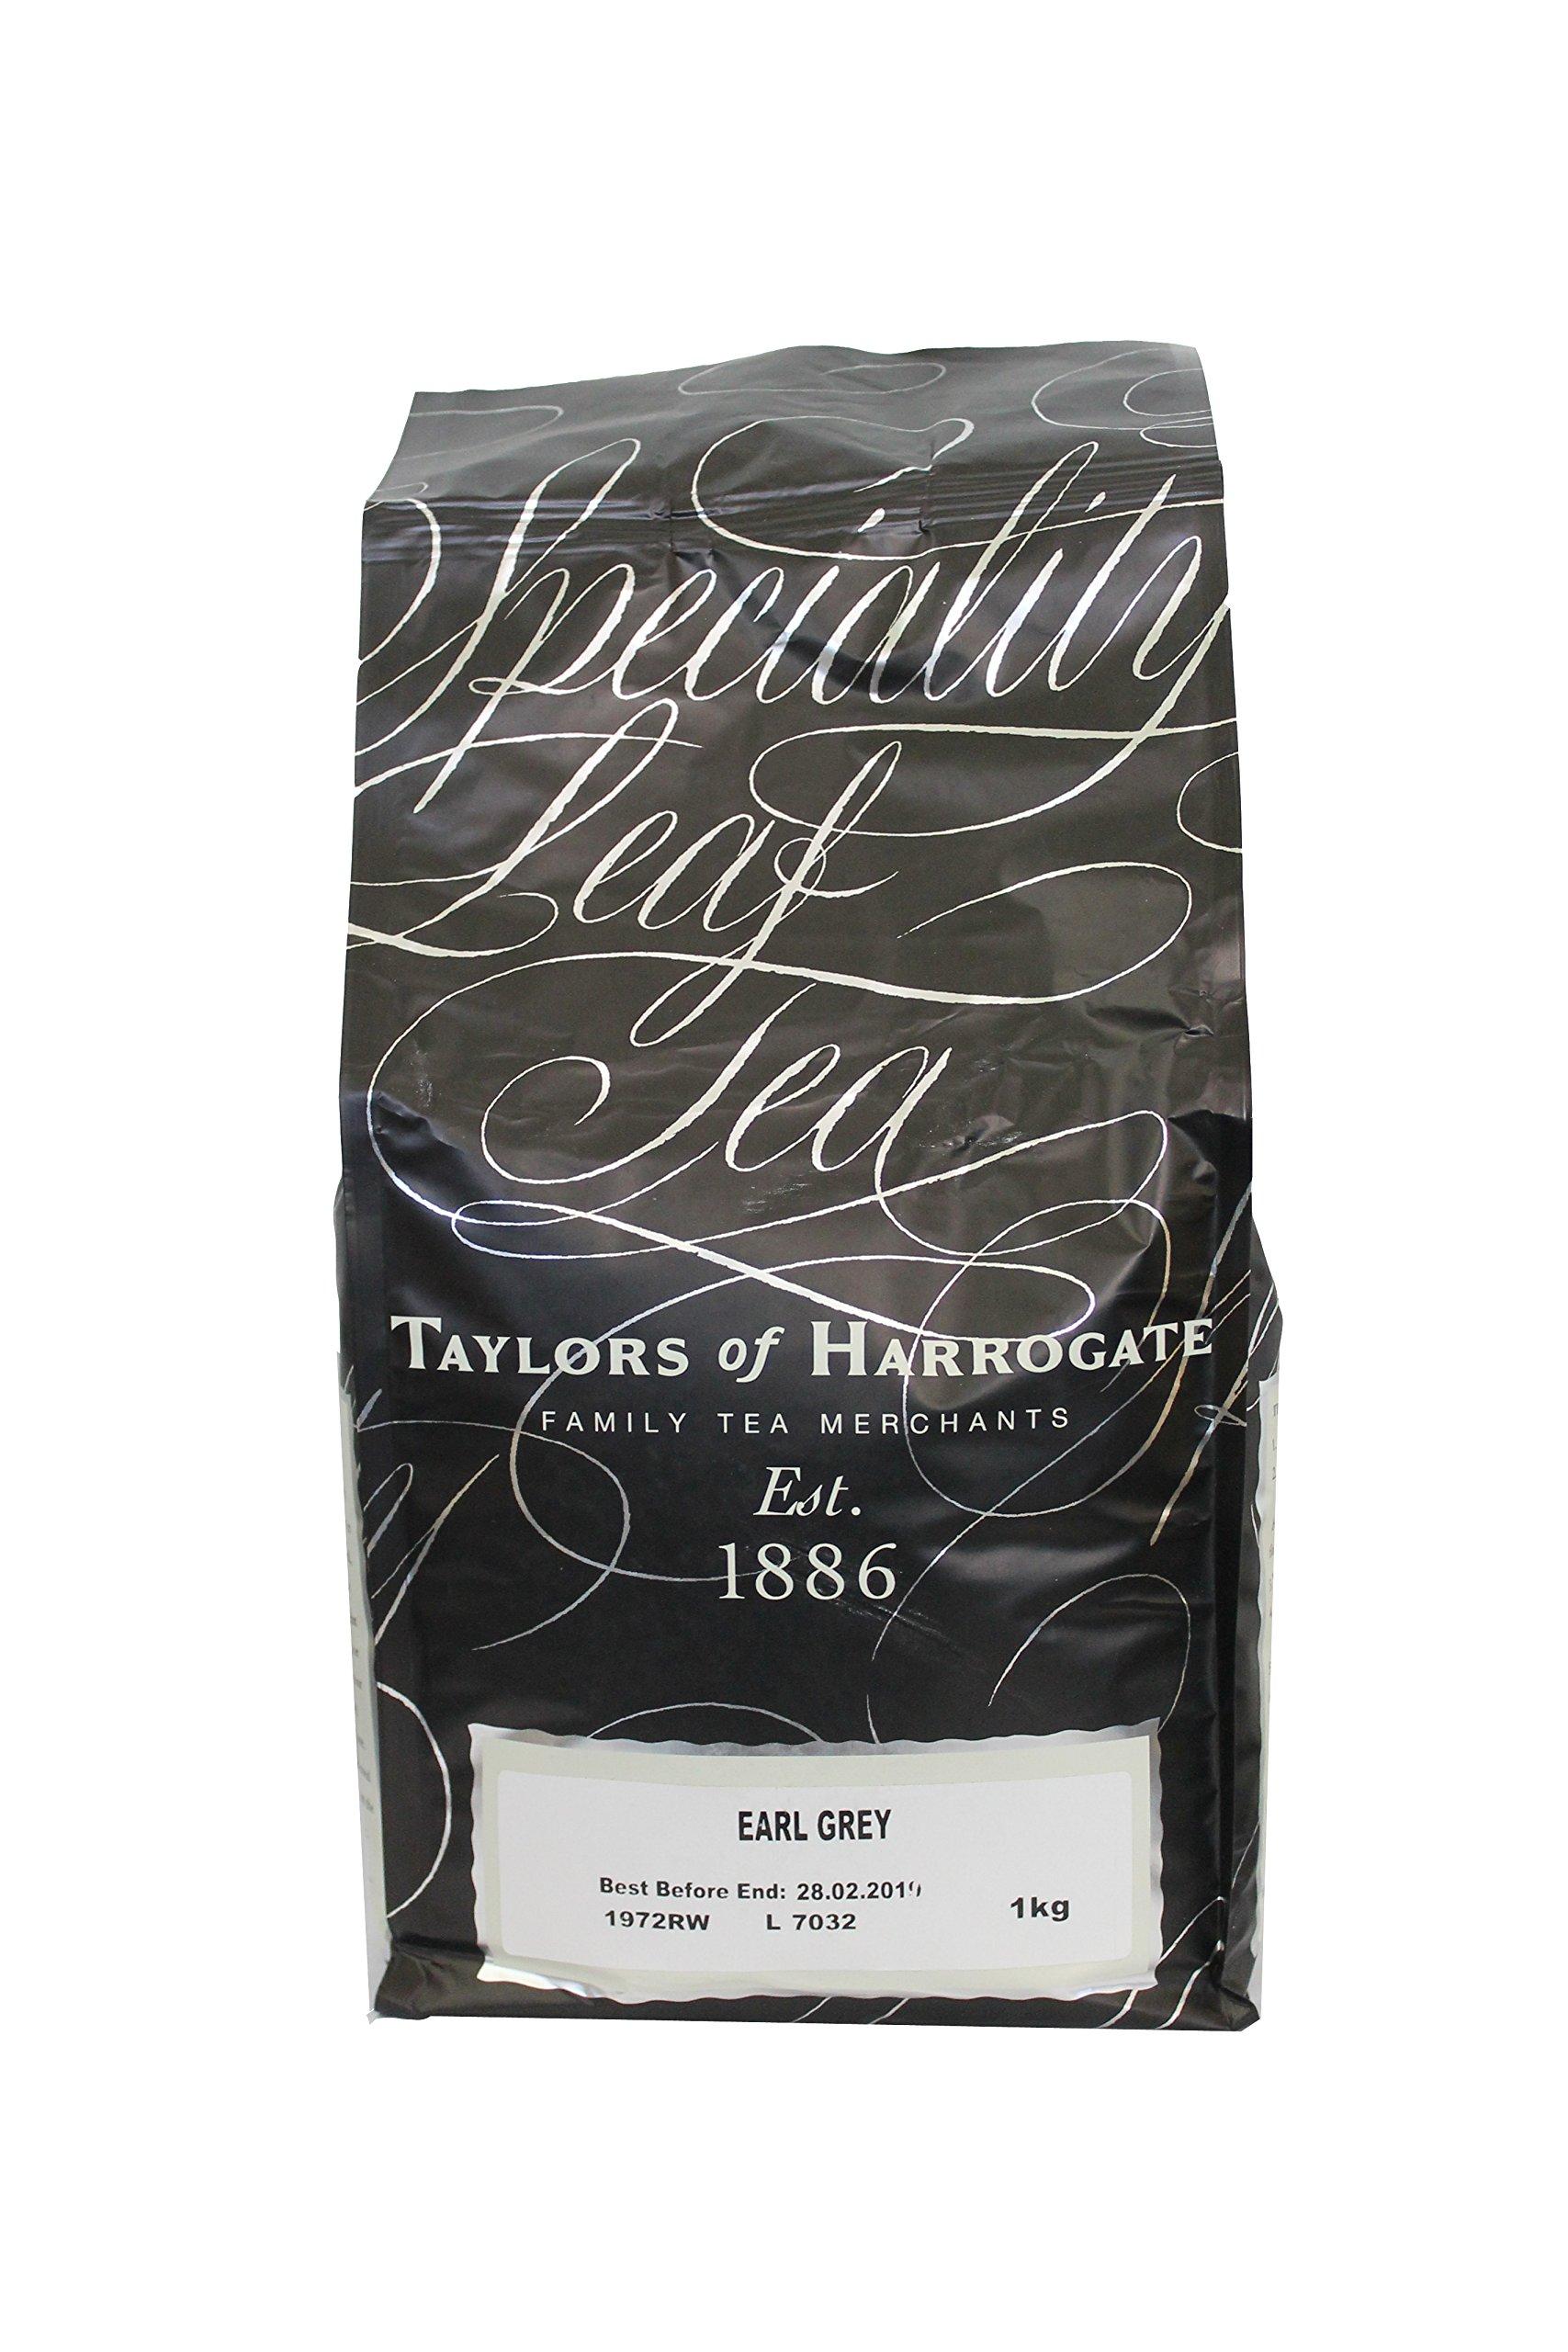 Taylors of Harrogate Earl Grey Loose Leaf, Kilo Bag by Taylors of Harrogate